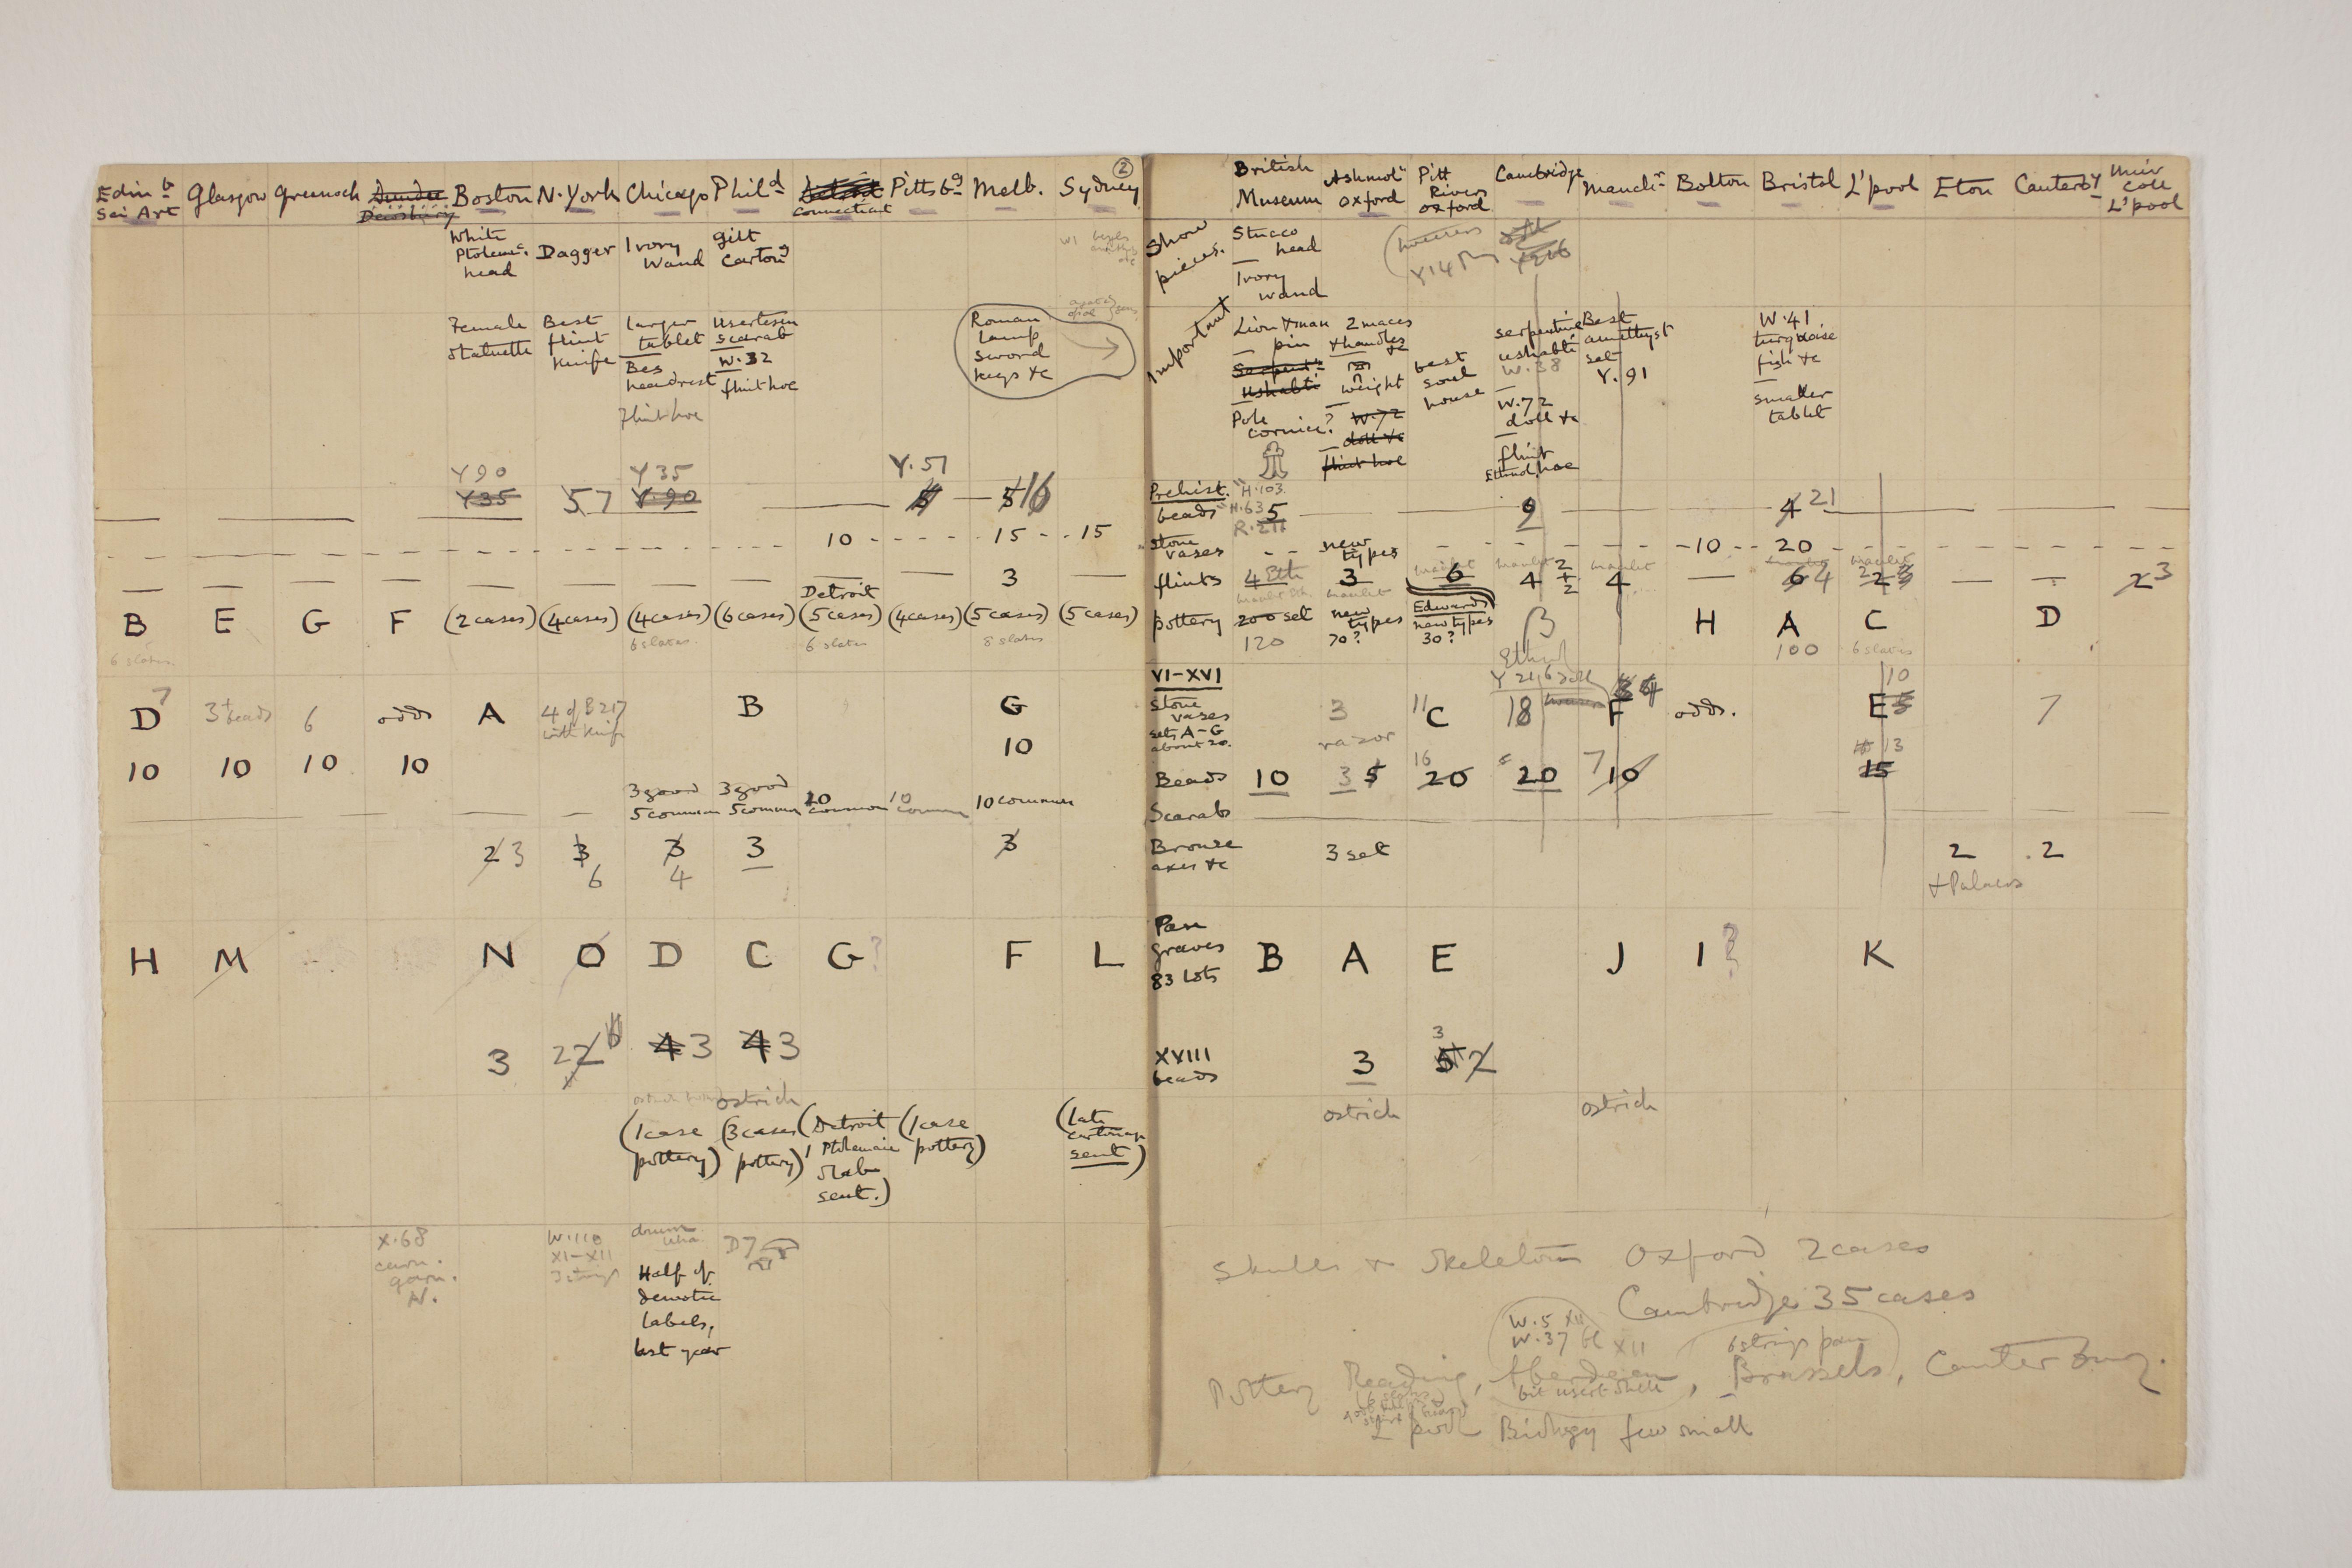 1898-99 Hu, Faiyum, Deir el-Bahri Multiple institution list PMA/WFP1/D/7/2.1